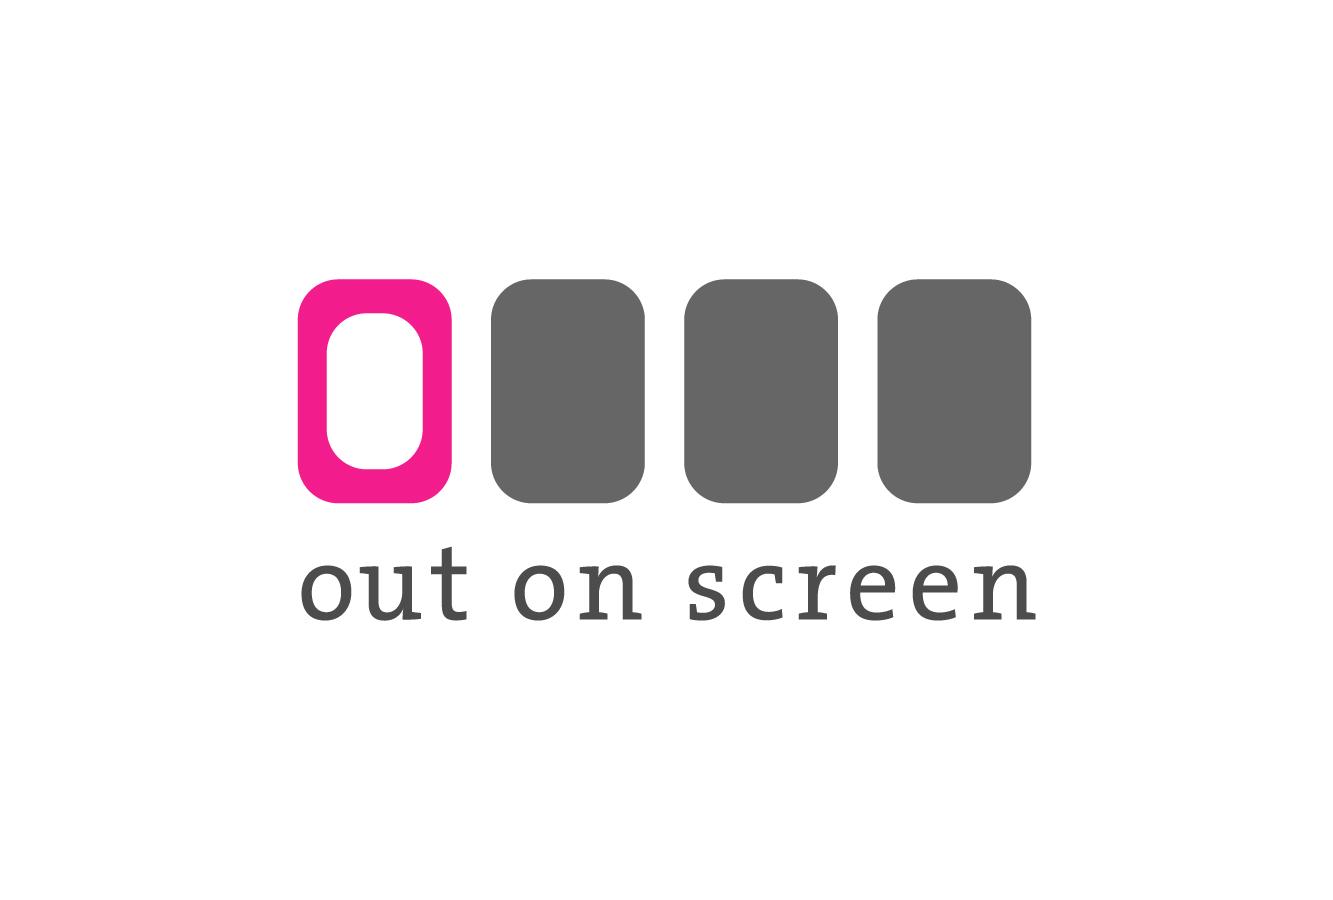 OutOnScreenLogo.jpg